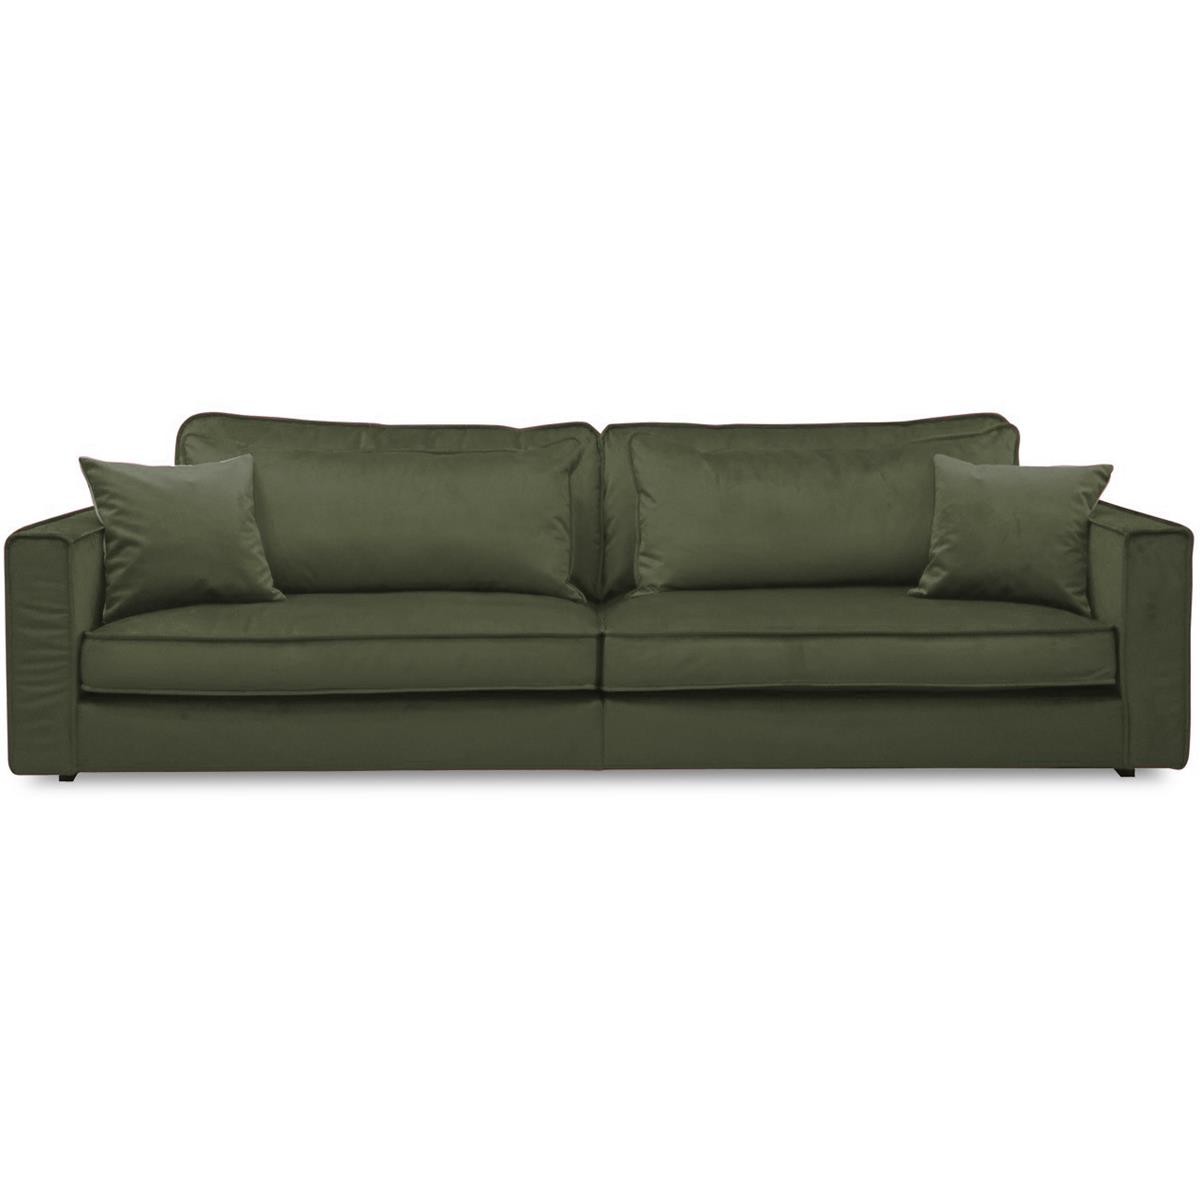 Luca-green-soffa-fasta-ryggkuddar